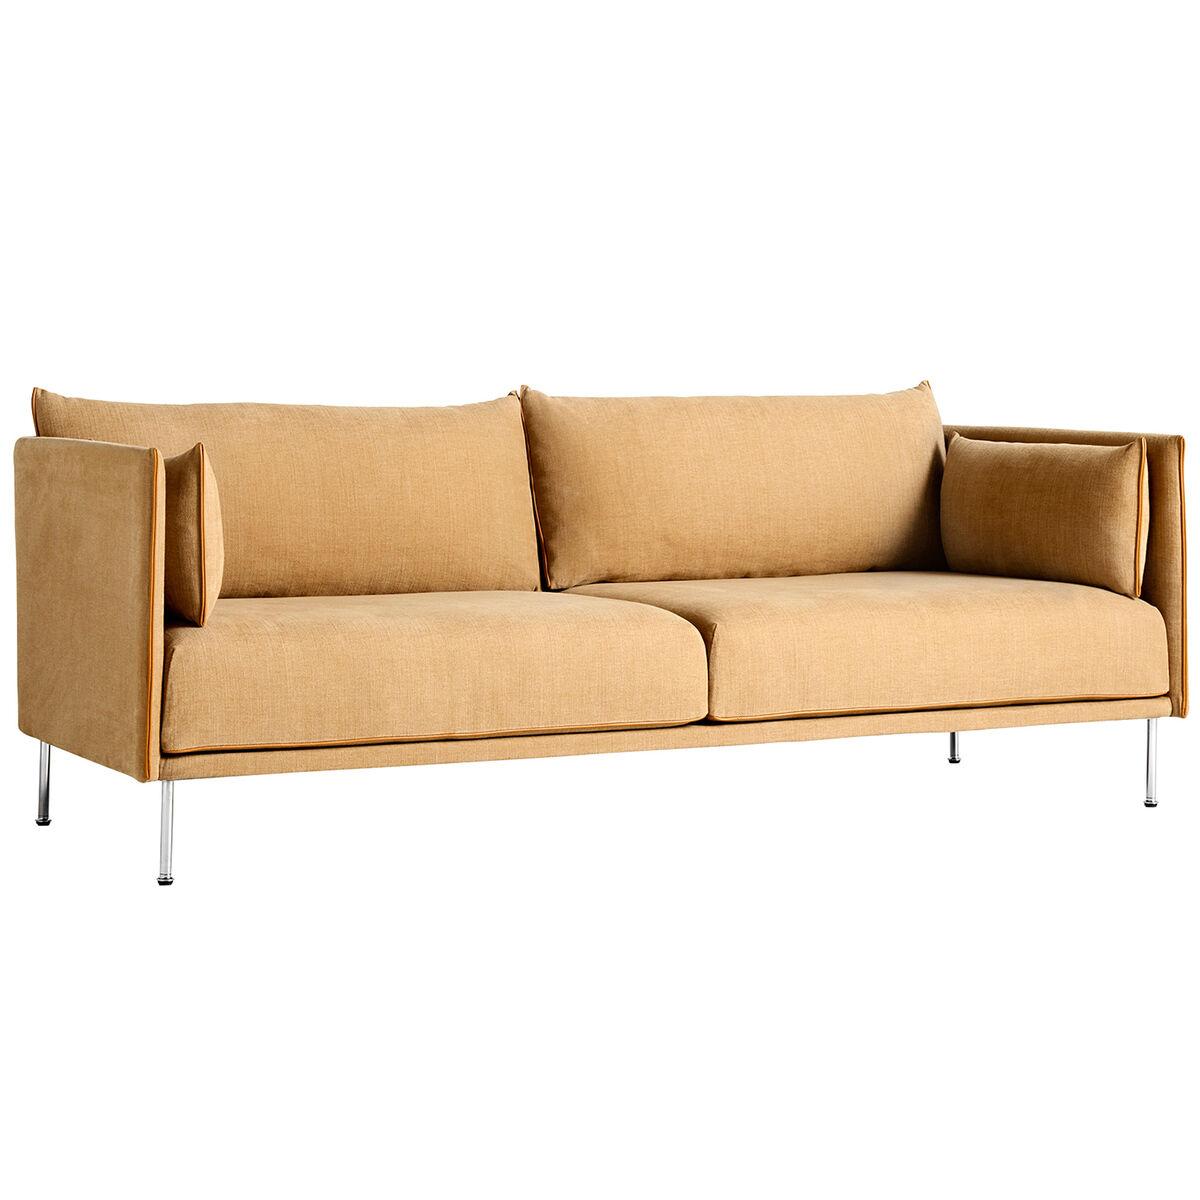 Image of Hay Silhouette sohva 3-ist, Linara 142/Silk cognac - kromi